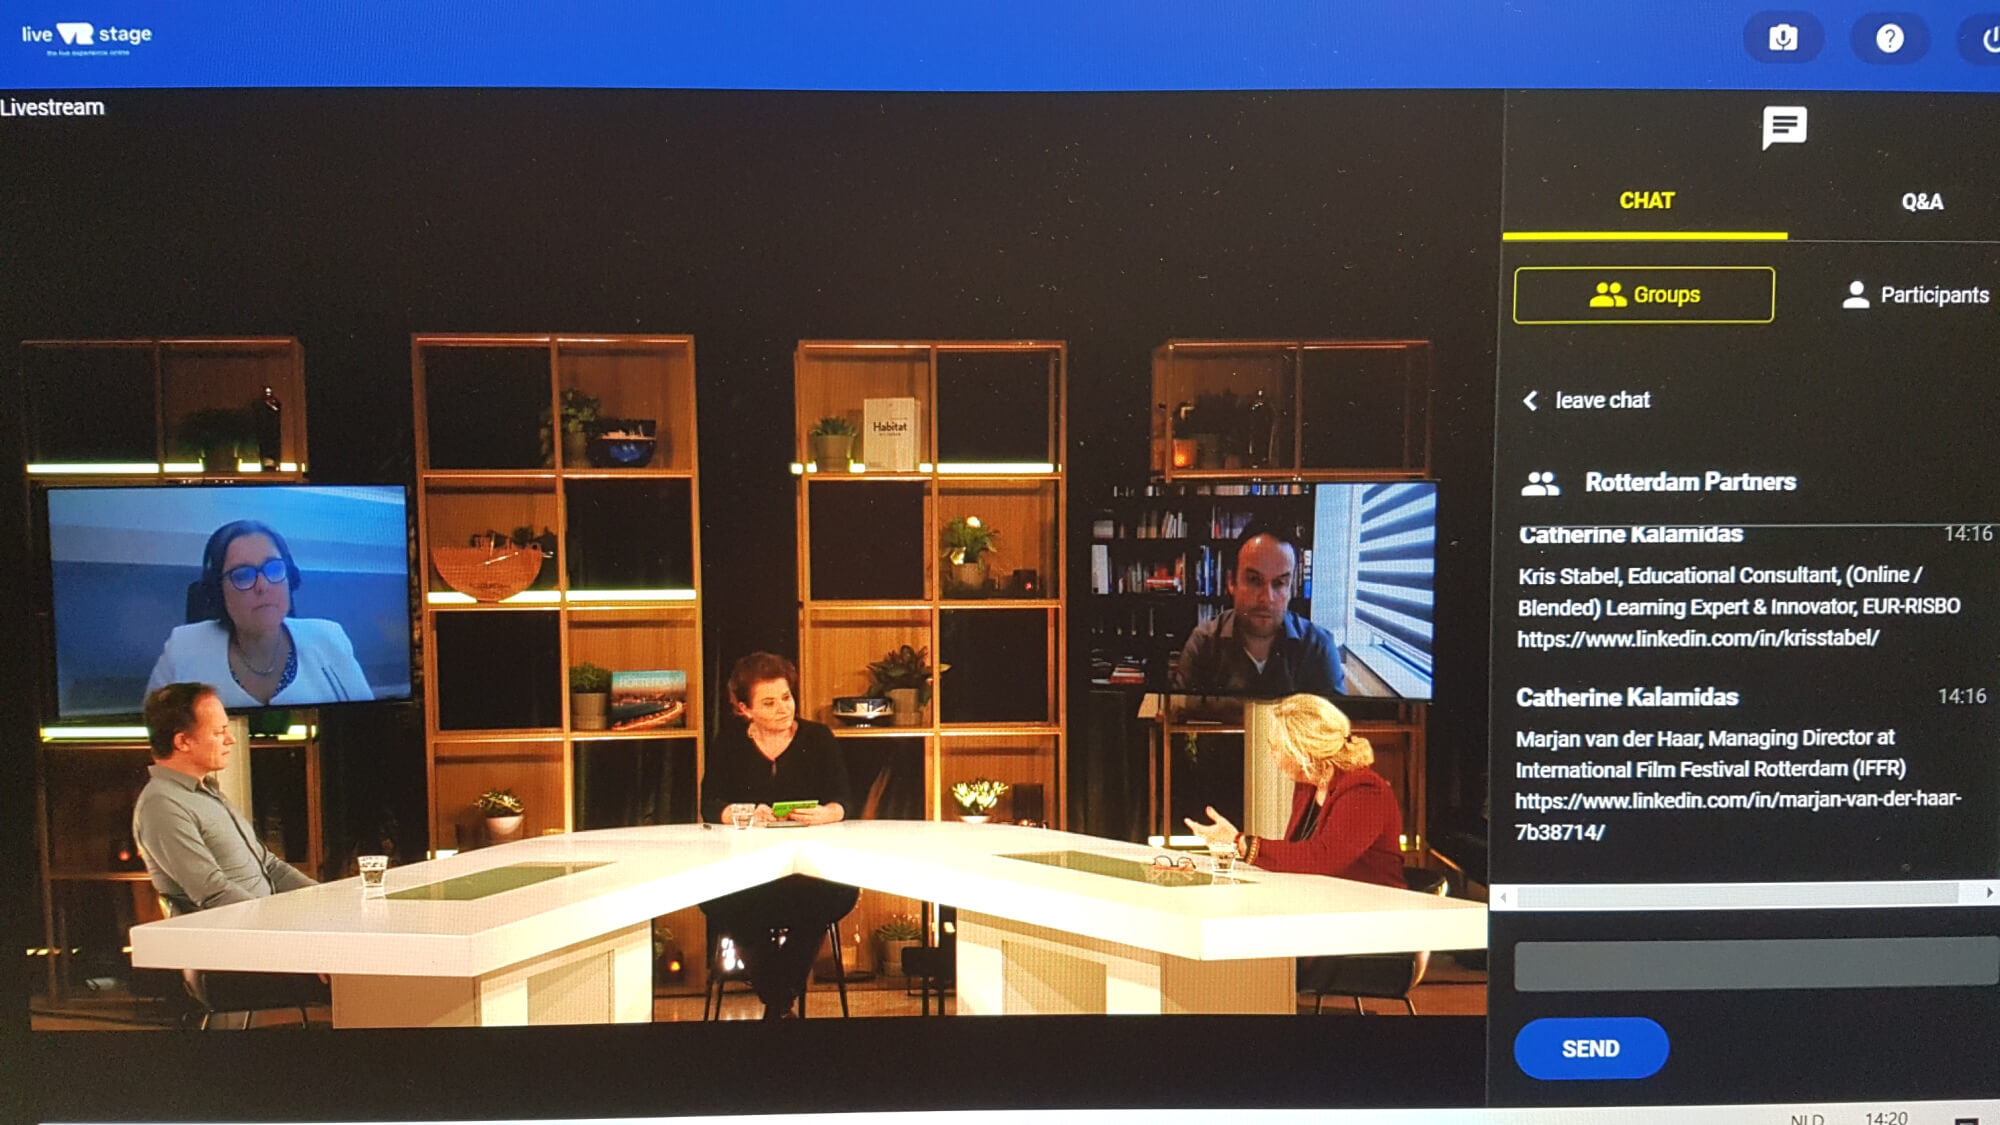 In de Live VR Stage studio sprak Mirjam van de Kamp met experts Carola van der Hoeff (FIP), Marjan van der Haar (IFFR), Yuri van Geest (Singularity University) en Kris Stabel (EUR-Risbo).